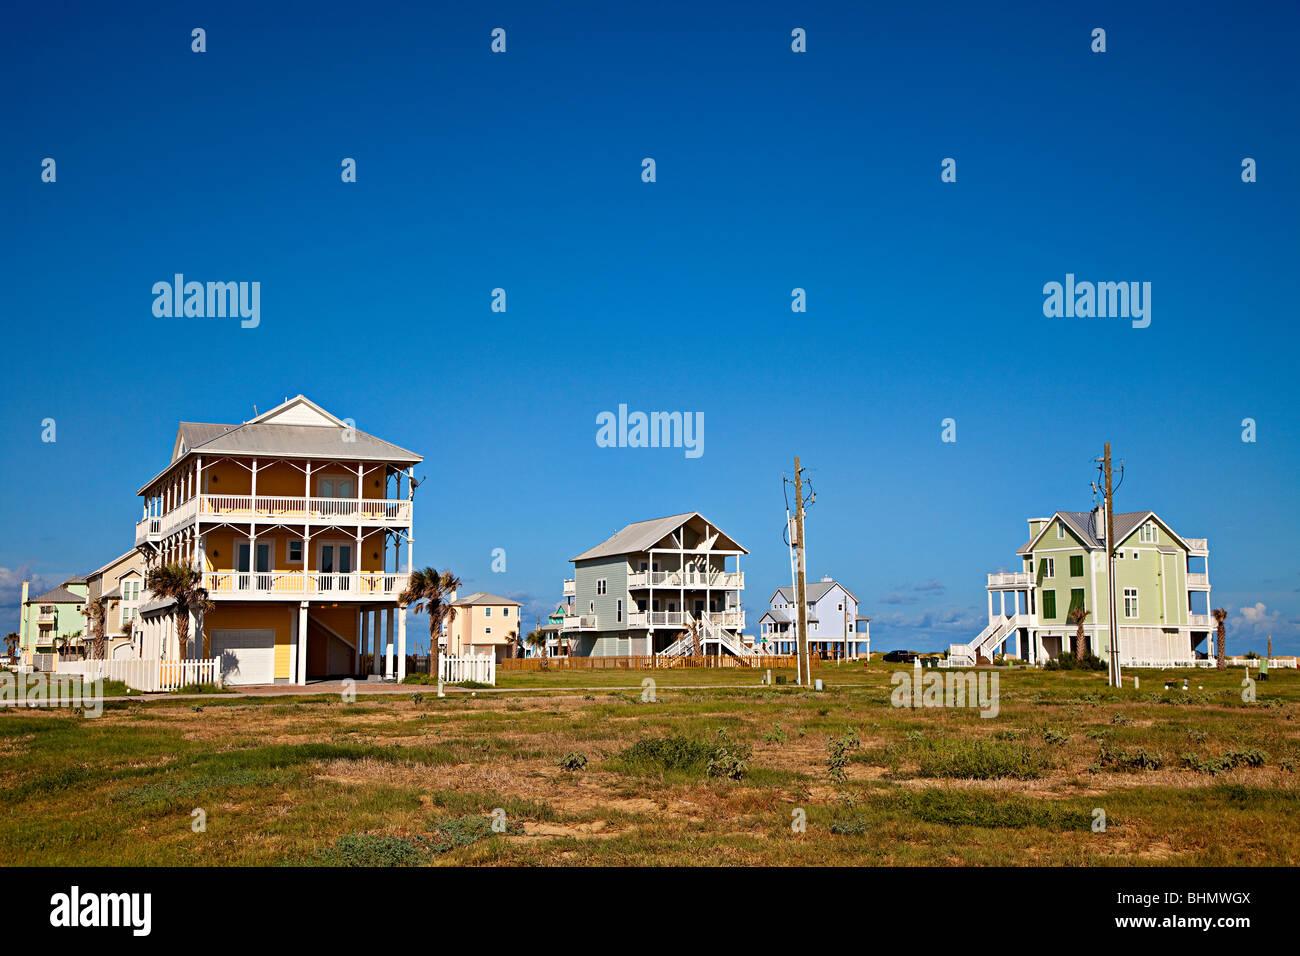 Houses on stilts in texas house plan 2017 for Beach house plans usa